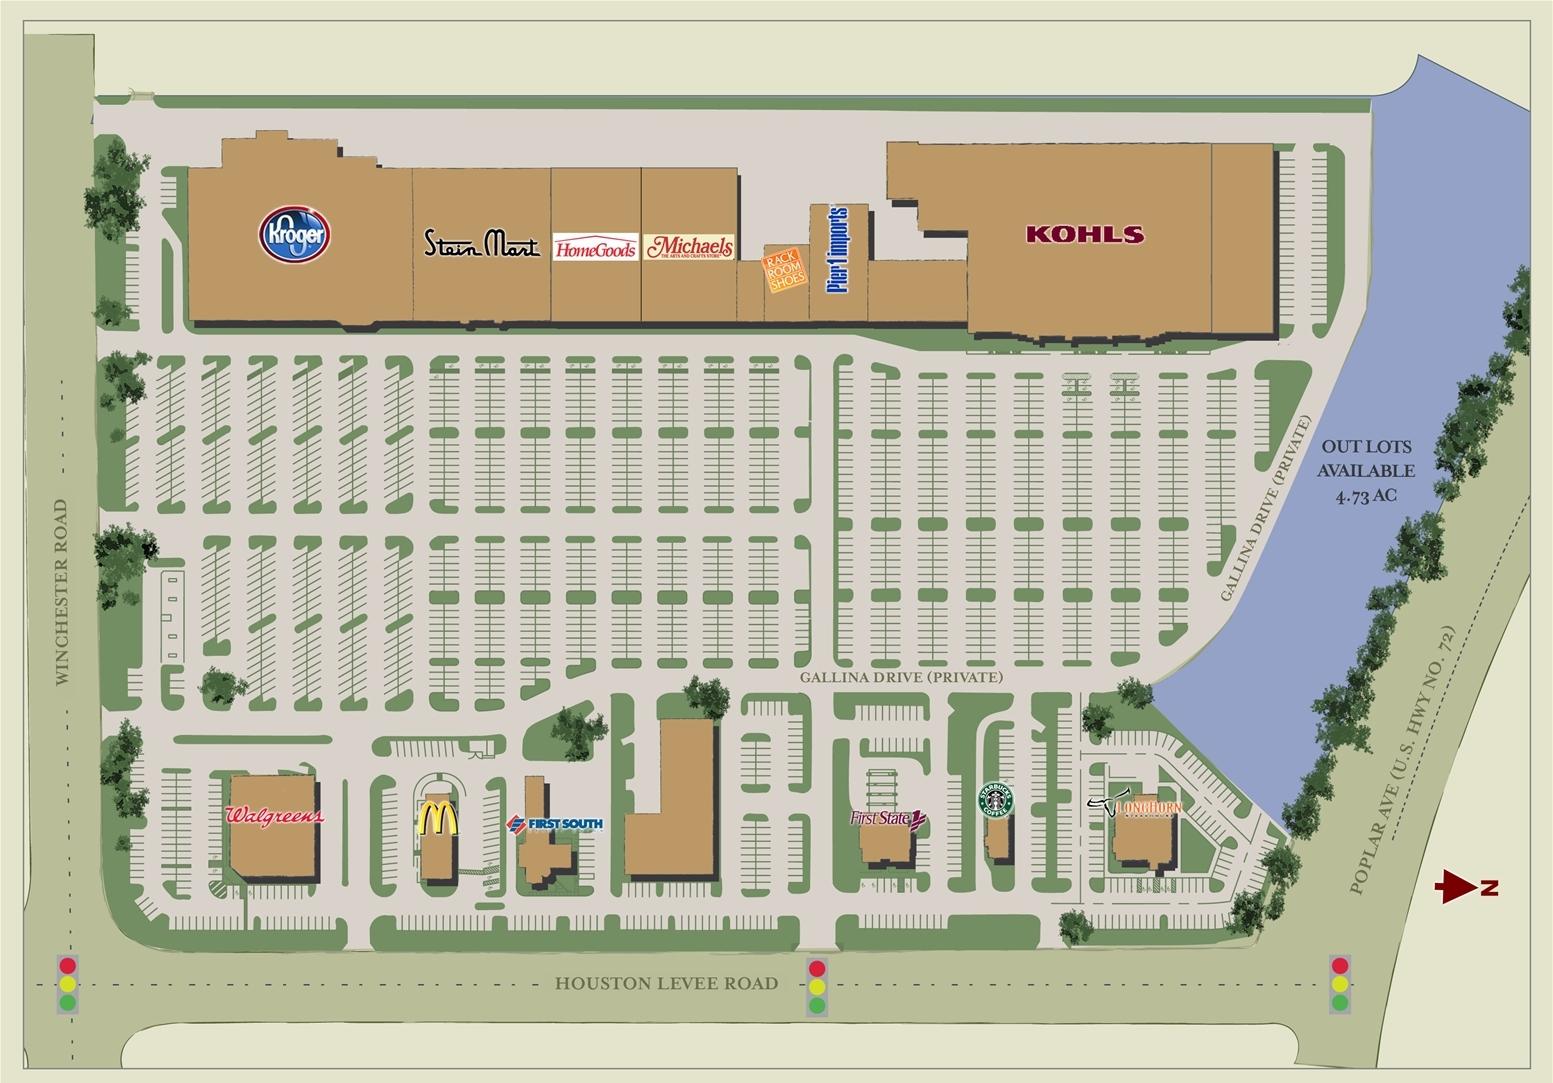 Gallina Centro Shopping Center Development Plan